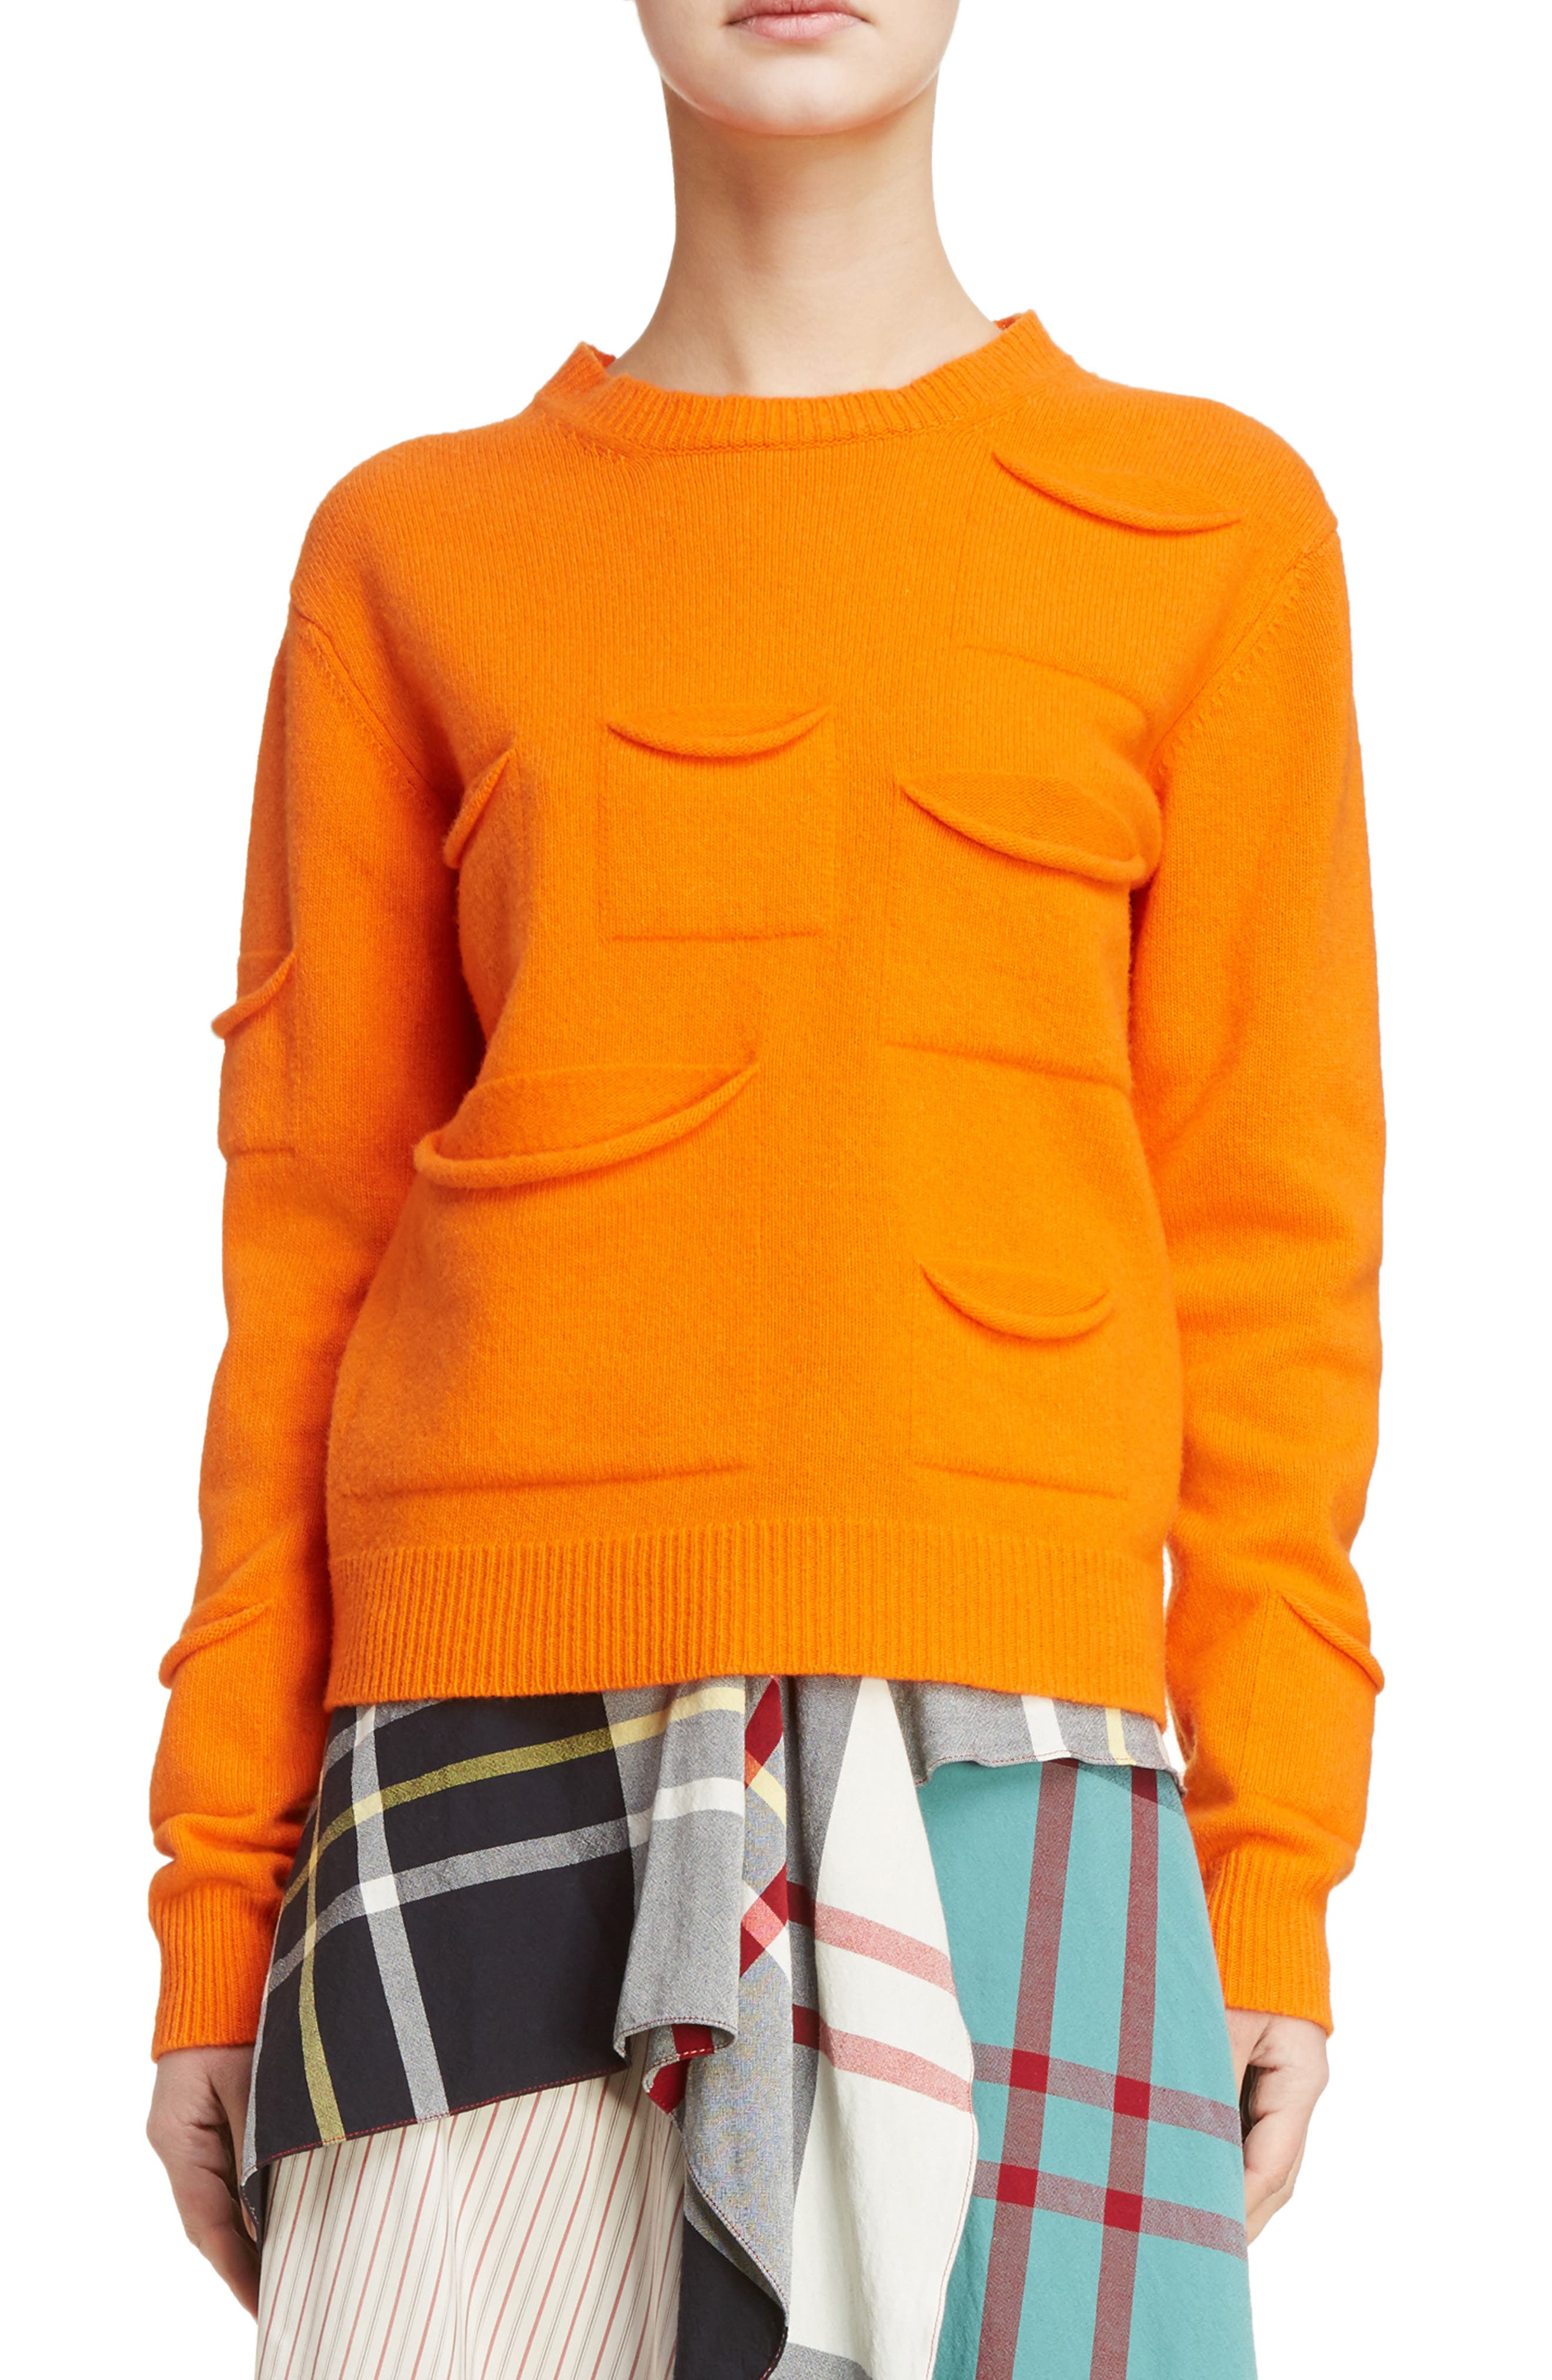 Main Image - J.W.ANDERSON Multi Pocket Crewneck Sweater